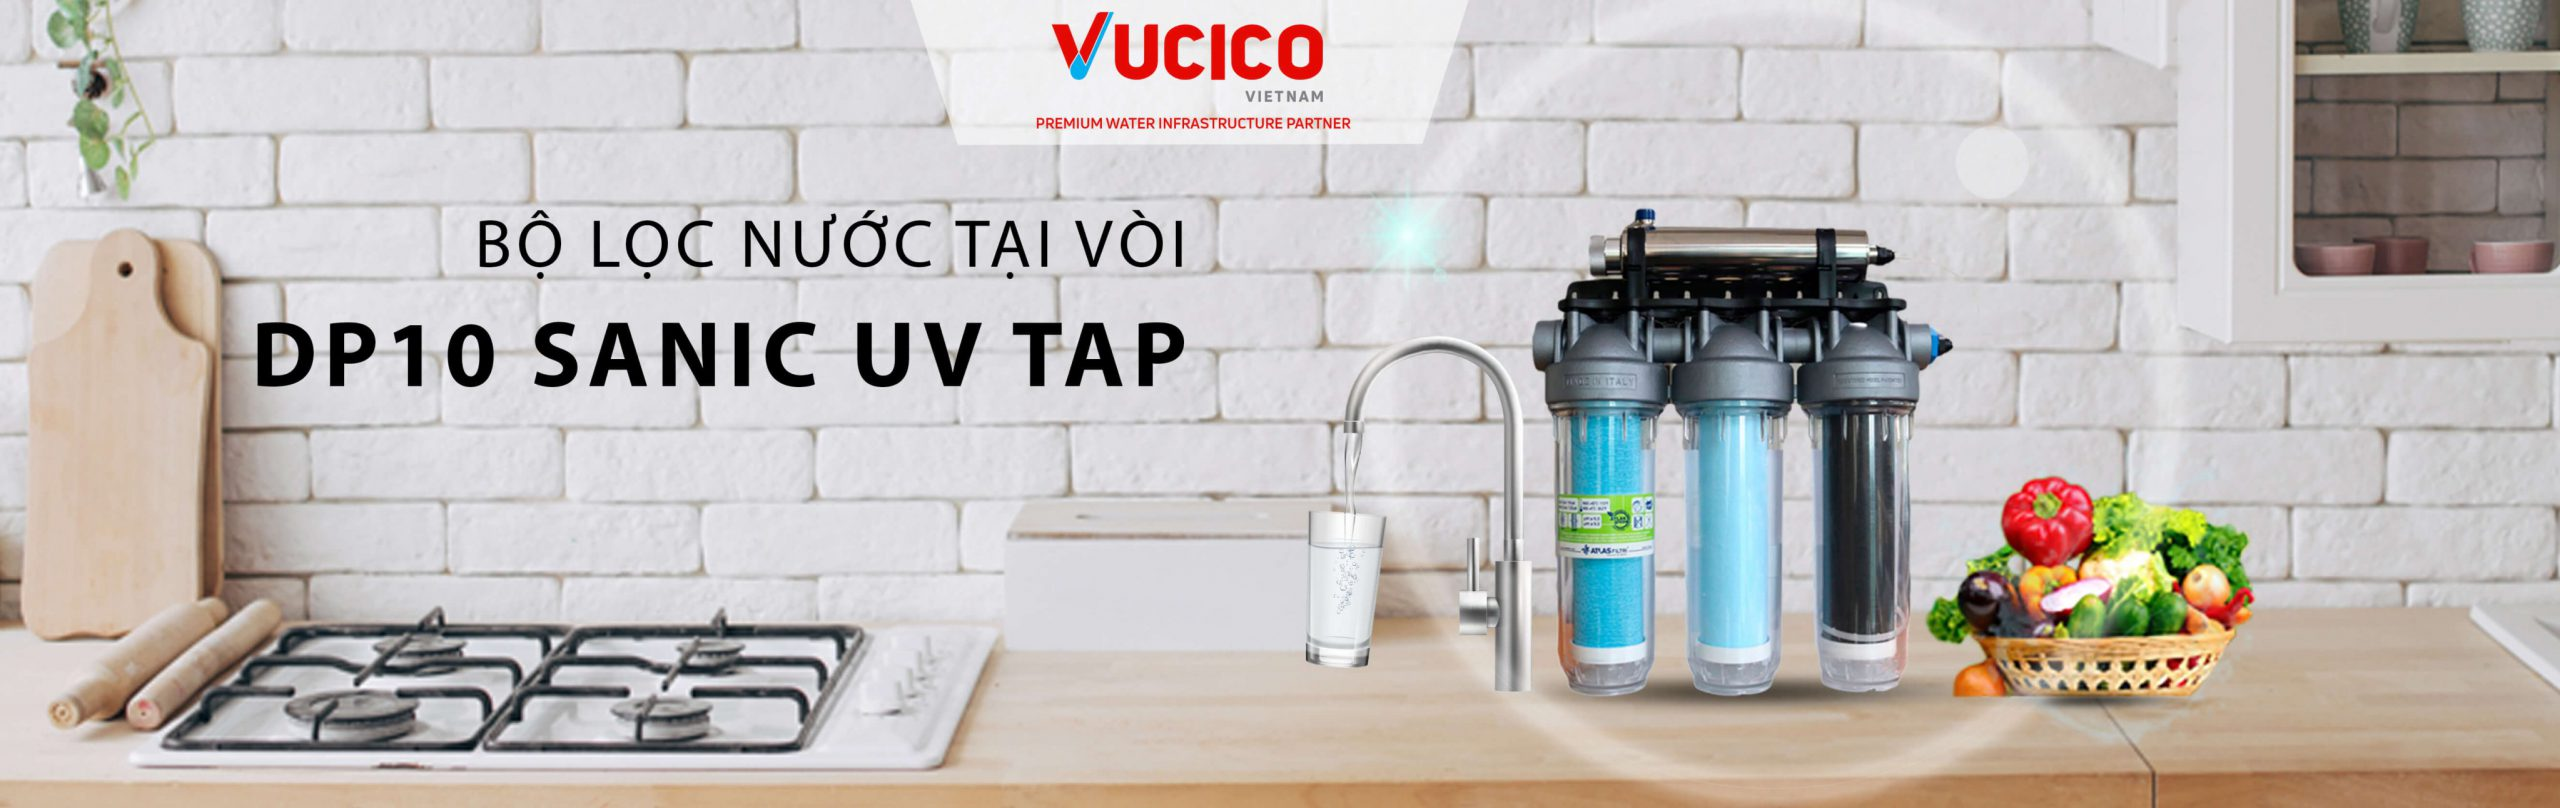 Vucico-Slider